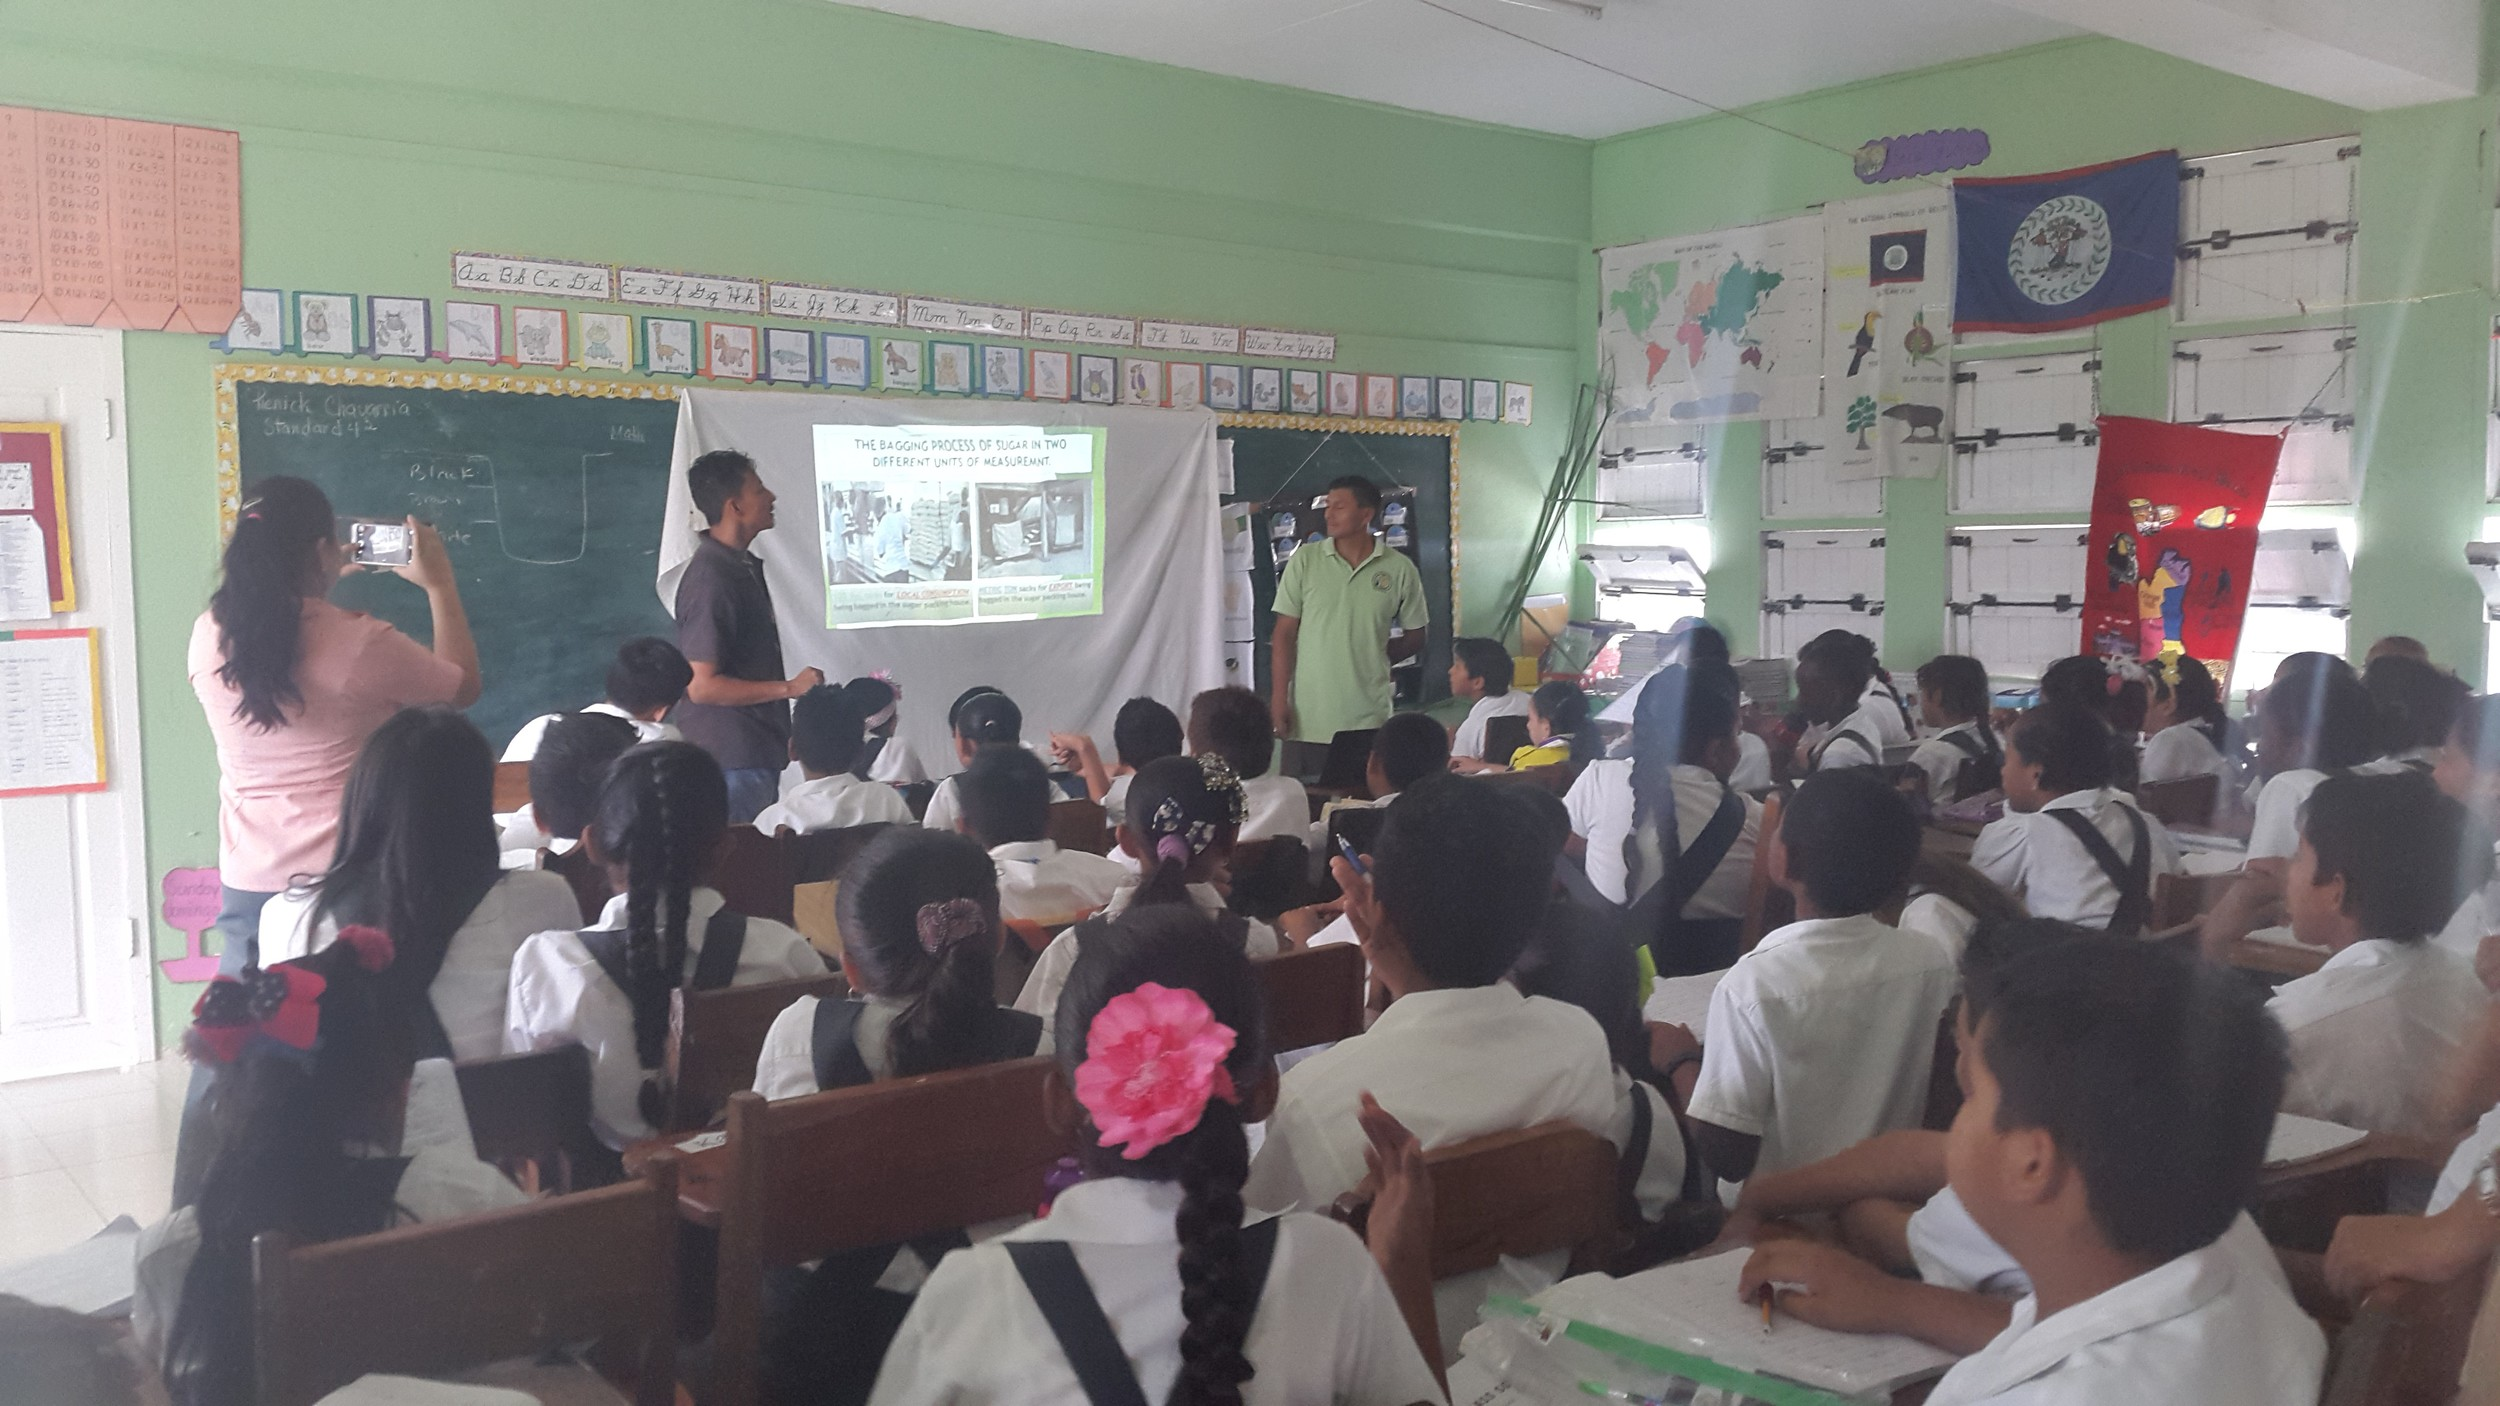 Field Officers, Angel Nicholson & Daniel Villanueva presenting at Mary Hill RC Primary School in the Corozal District